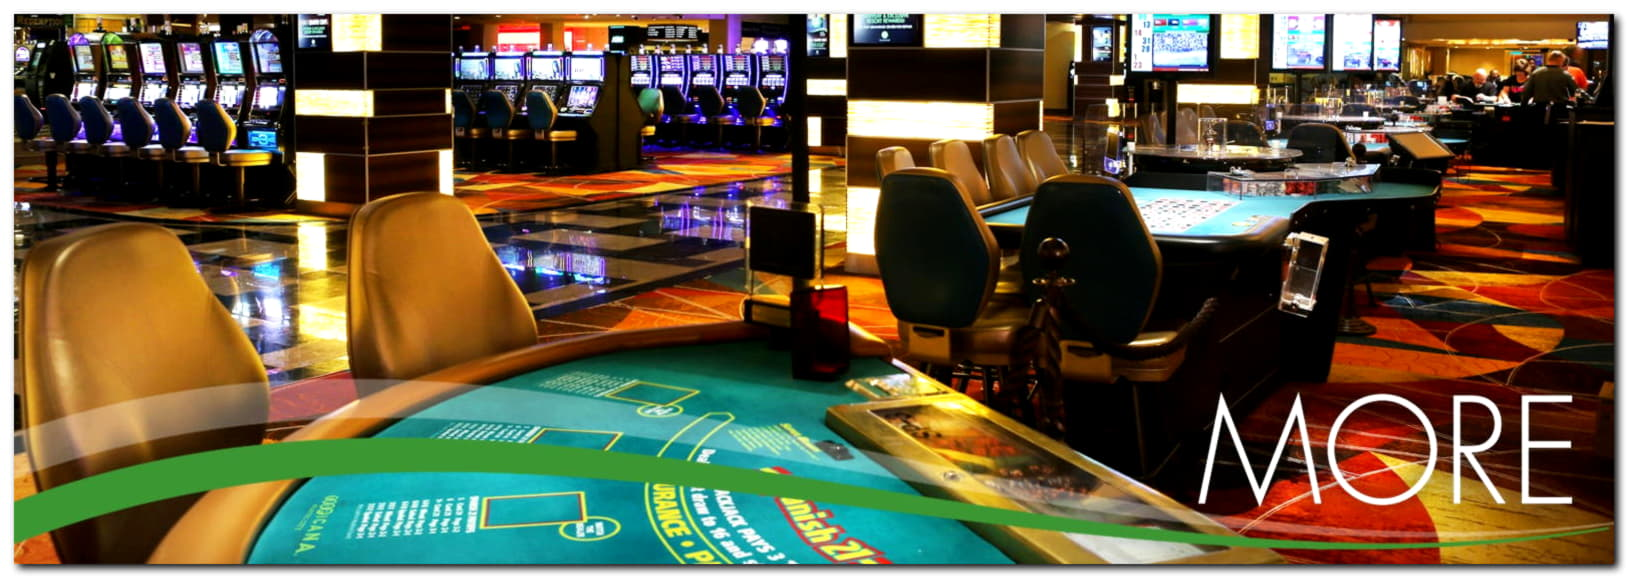 45 Free casino spins at Jet Bull Casino